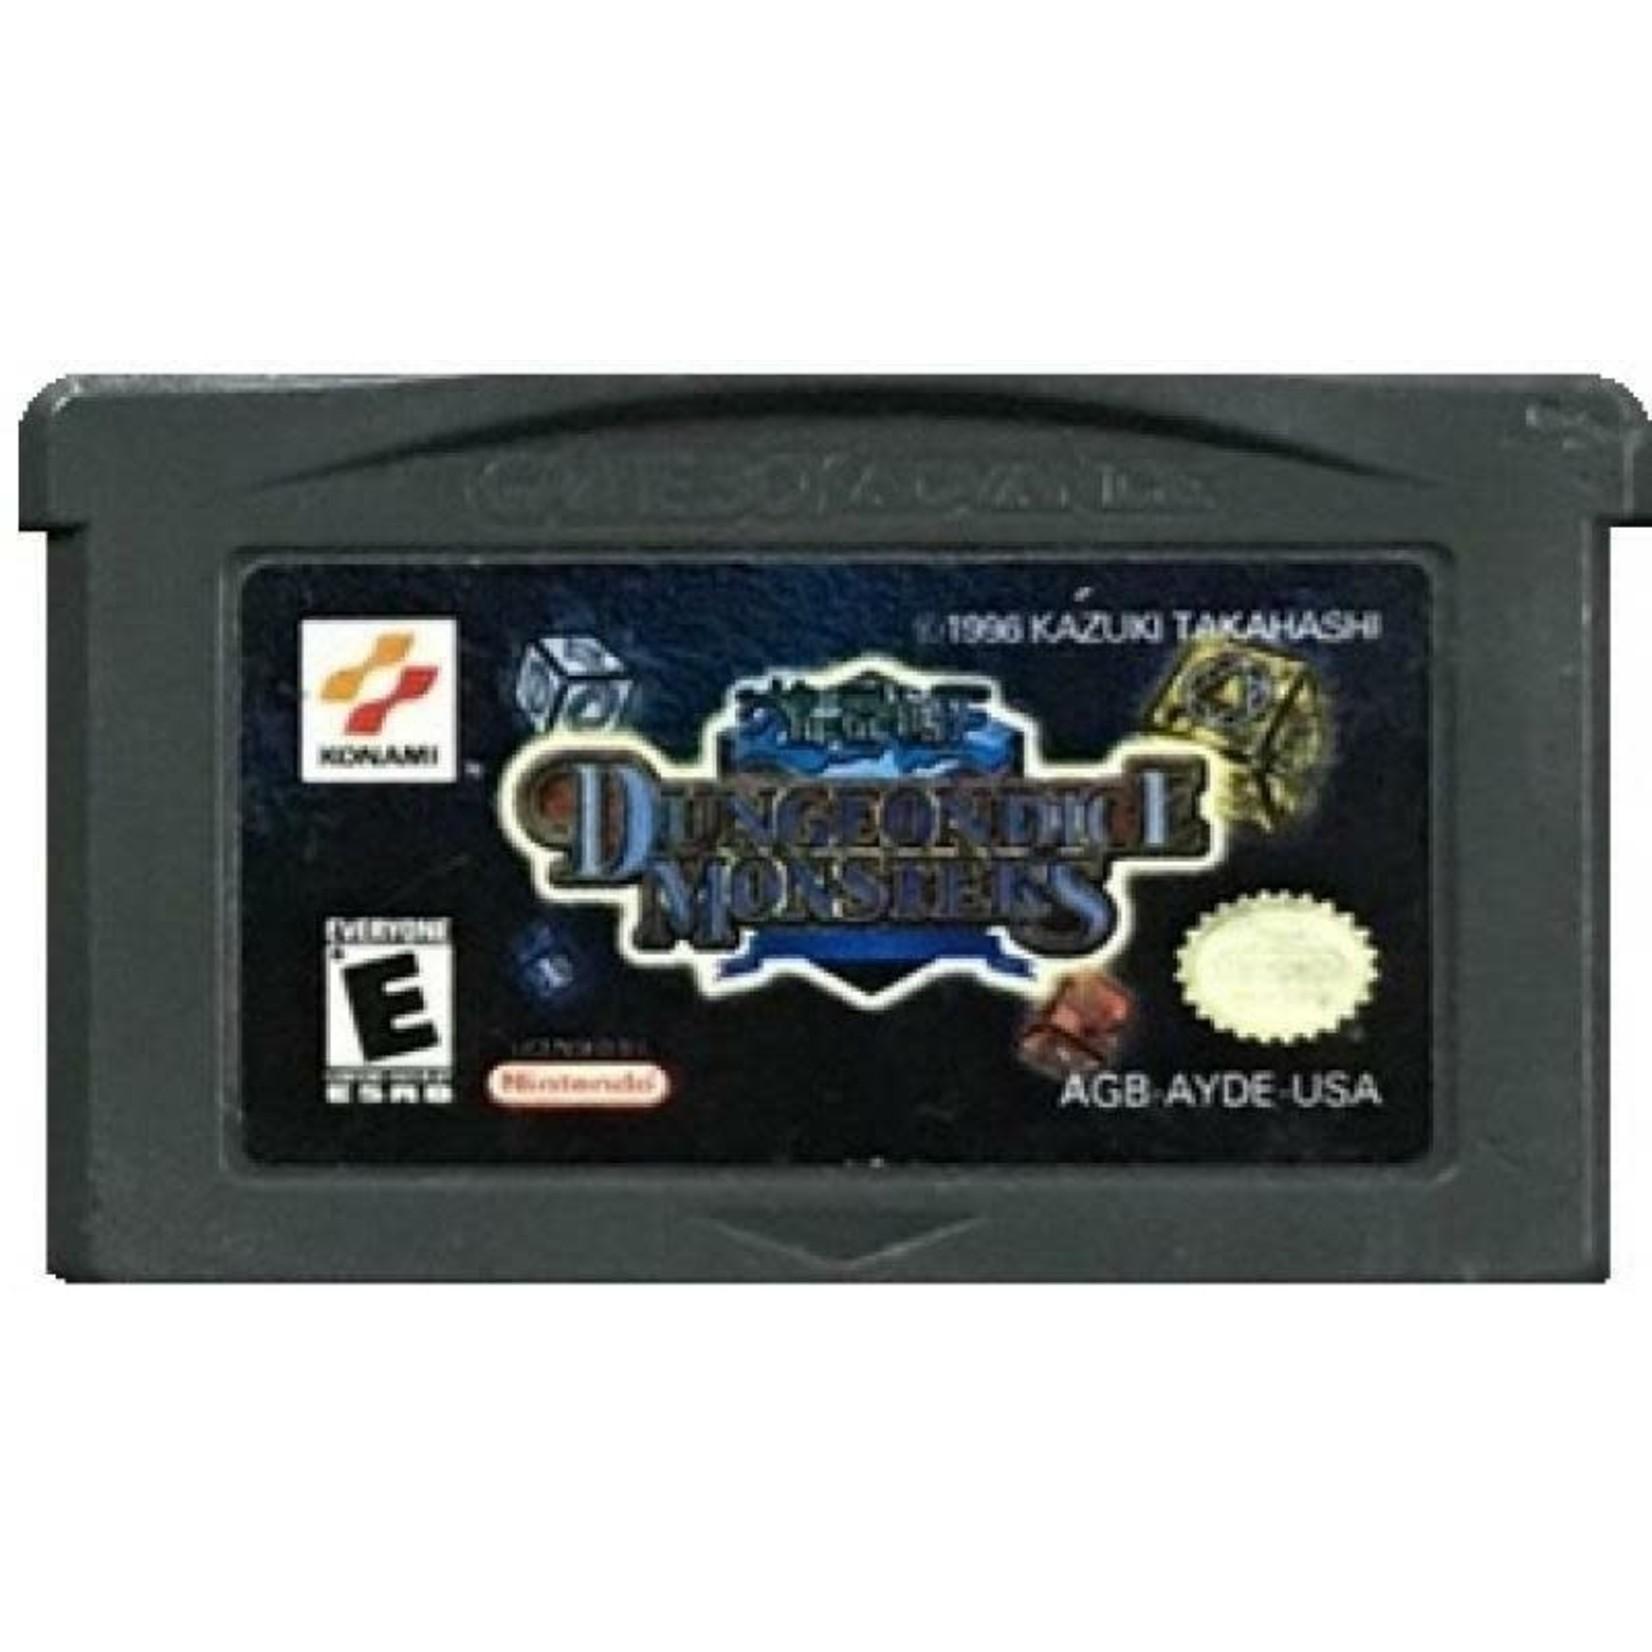 GBAU-Dungeon Dice Monsters (cartridge)